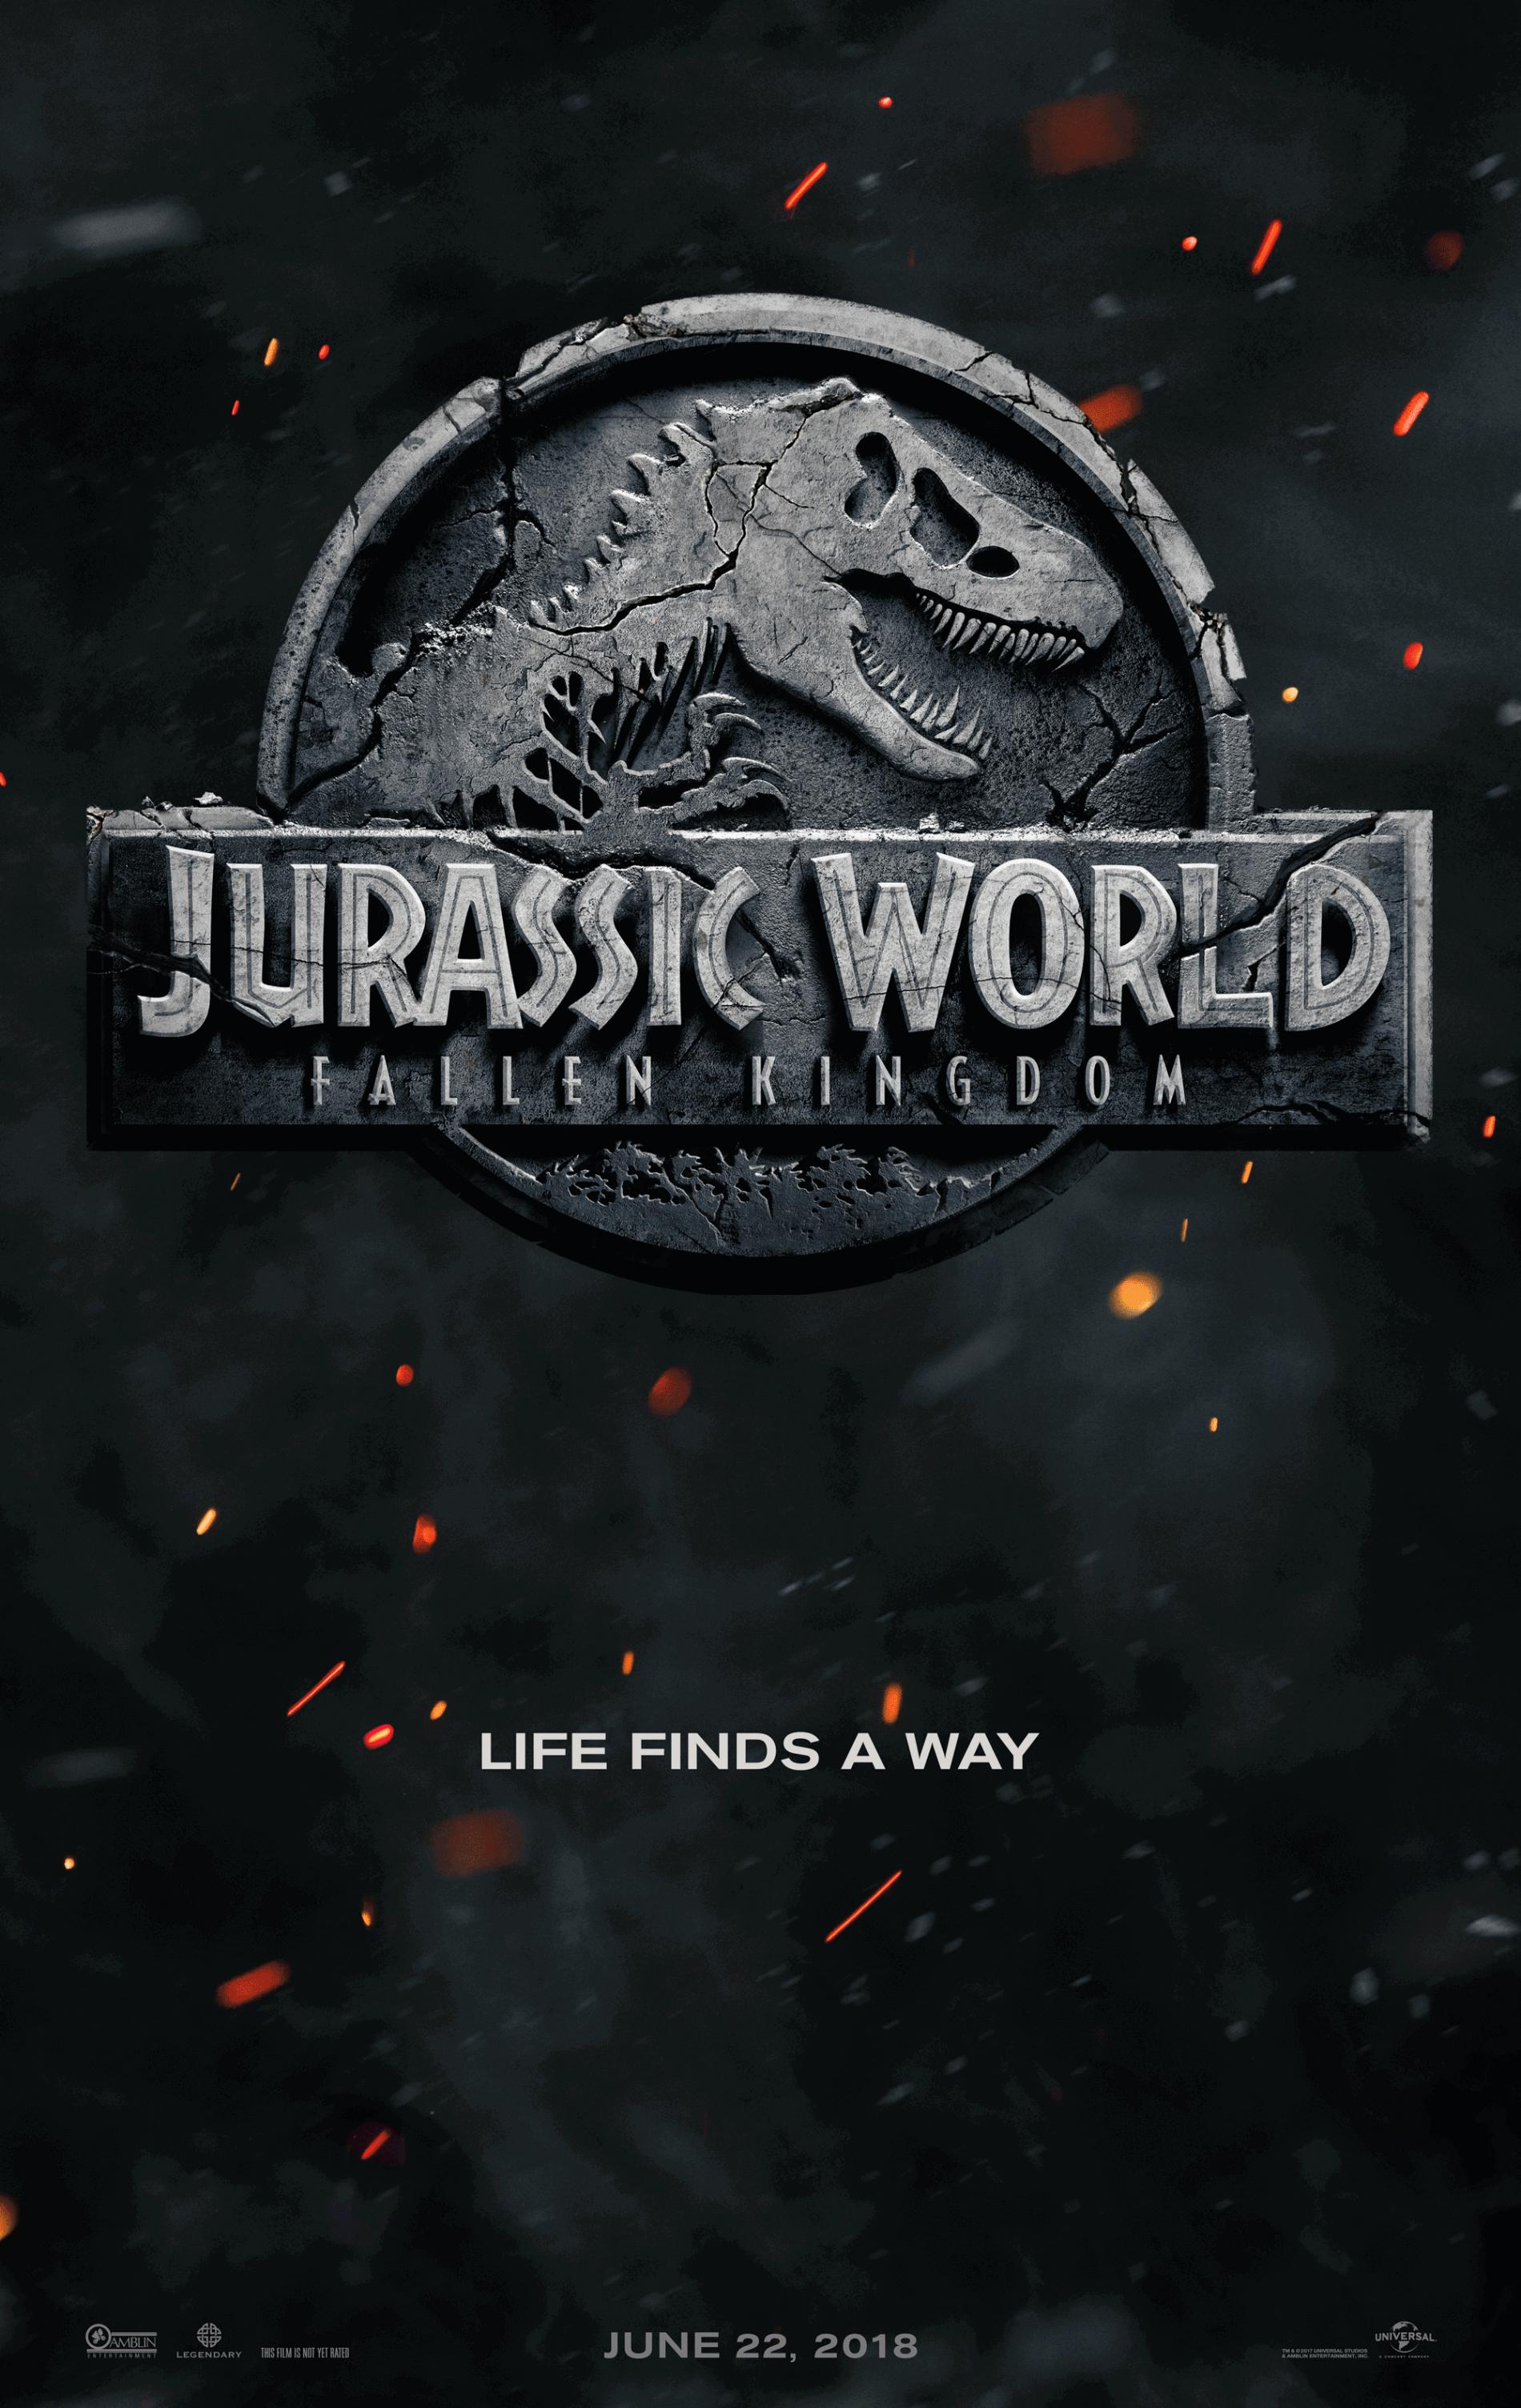 Official movie poster for Jurassic World Fallen Kingdom